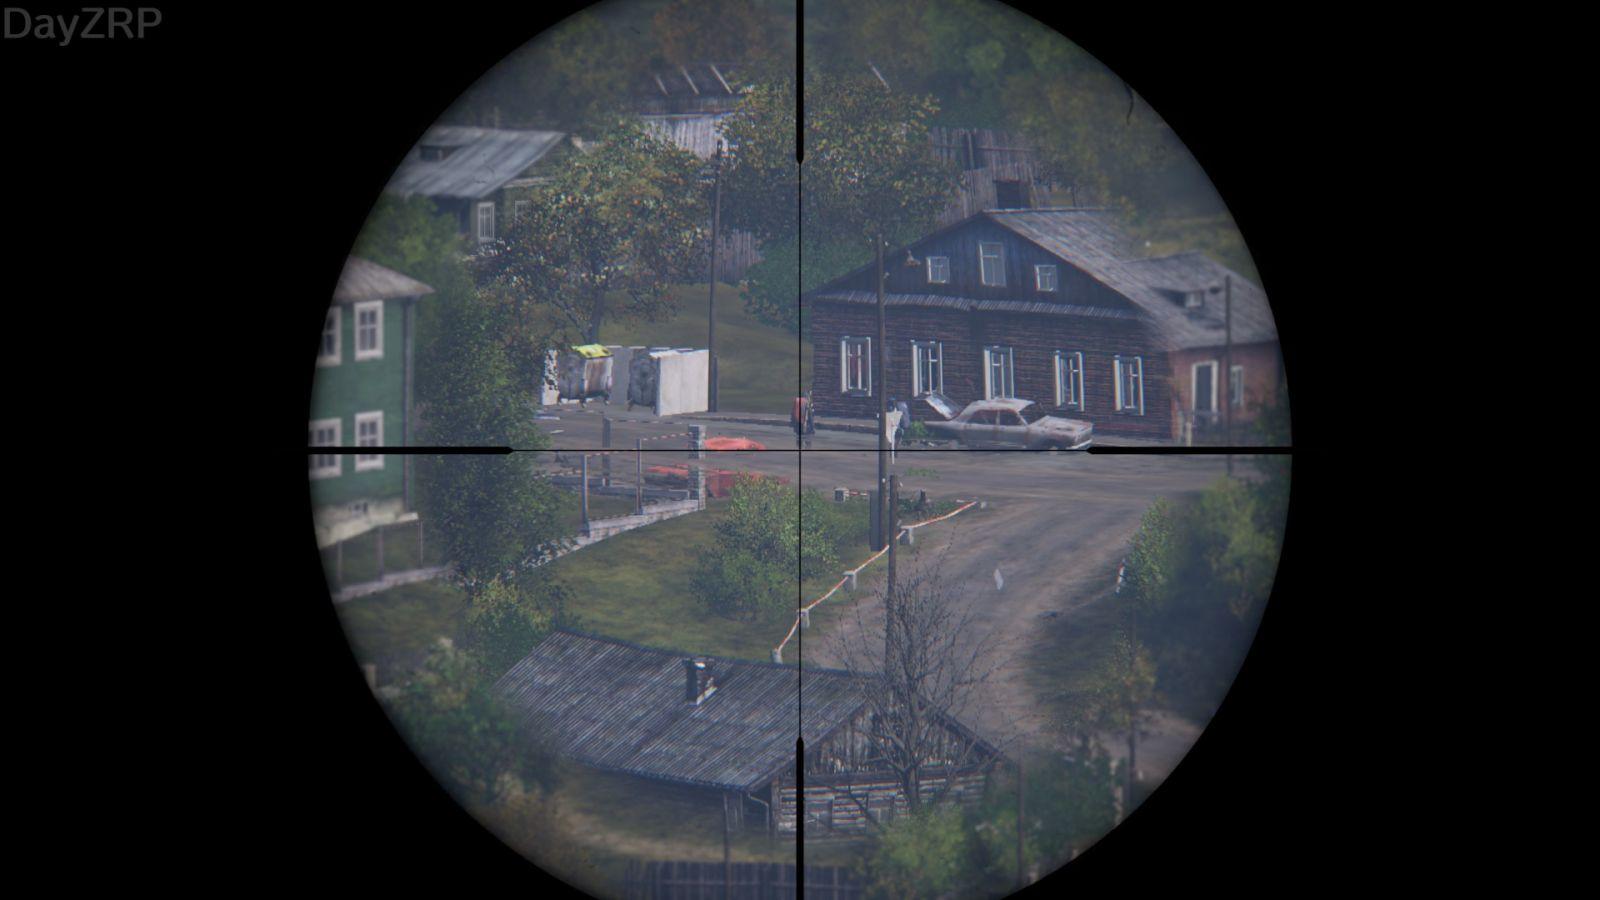 1 shot one kill